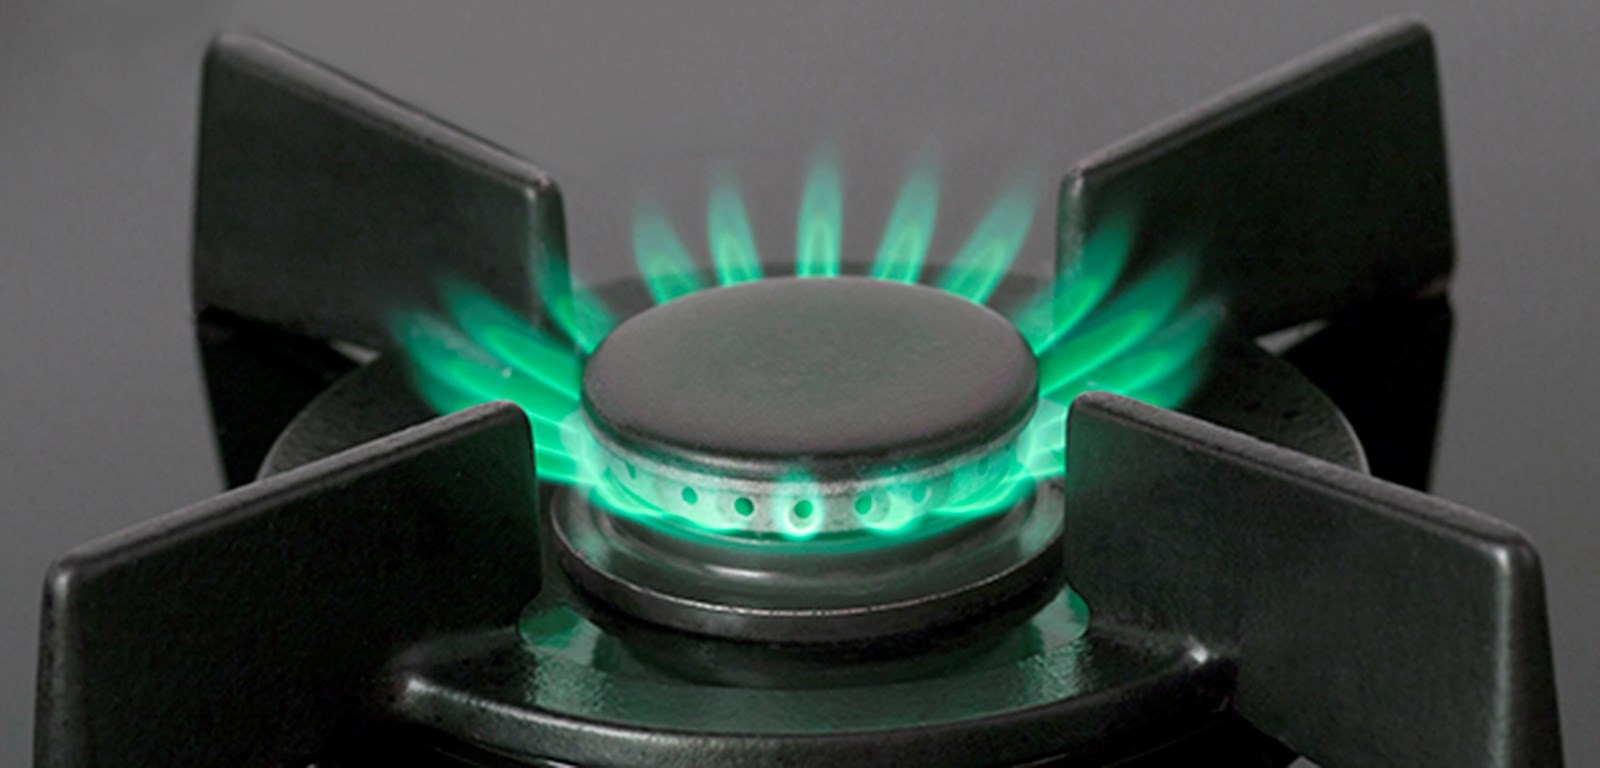 Aandeel groen gas neemt fors toe